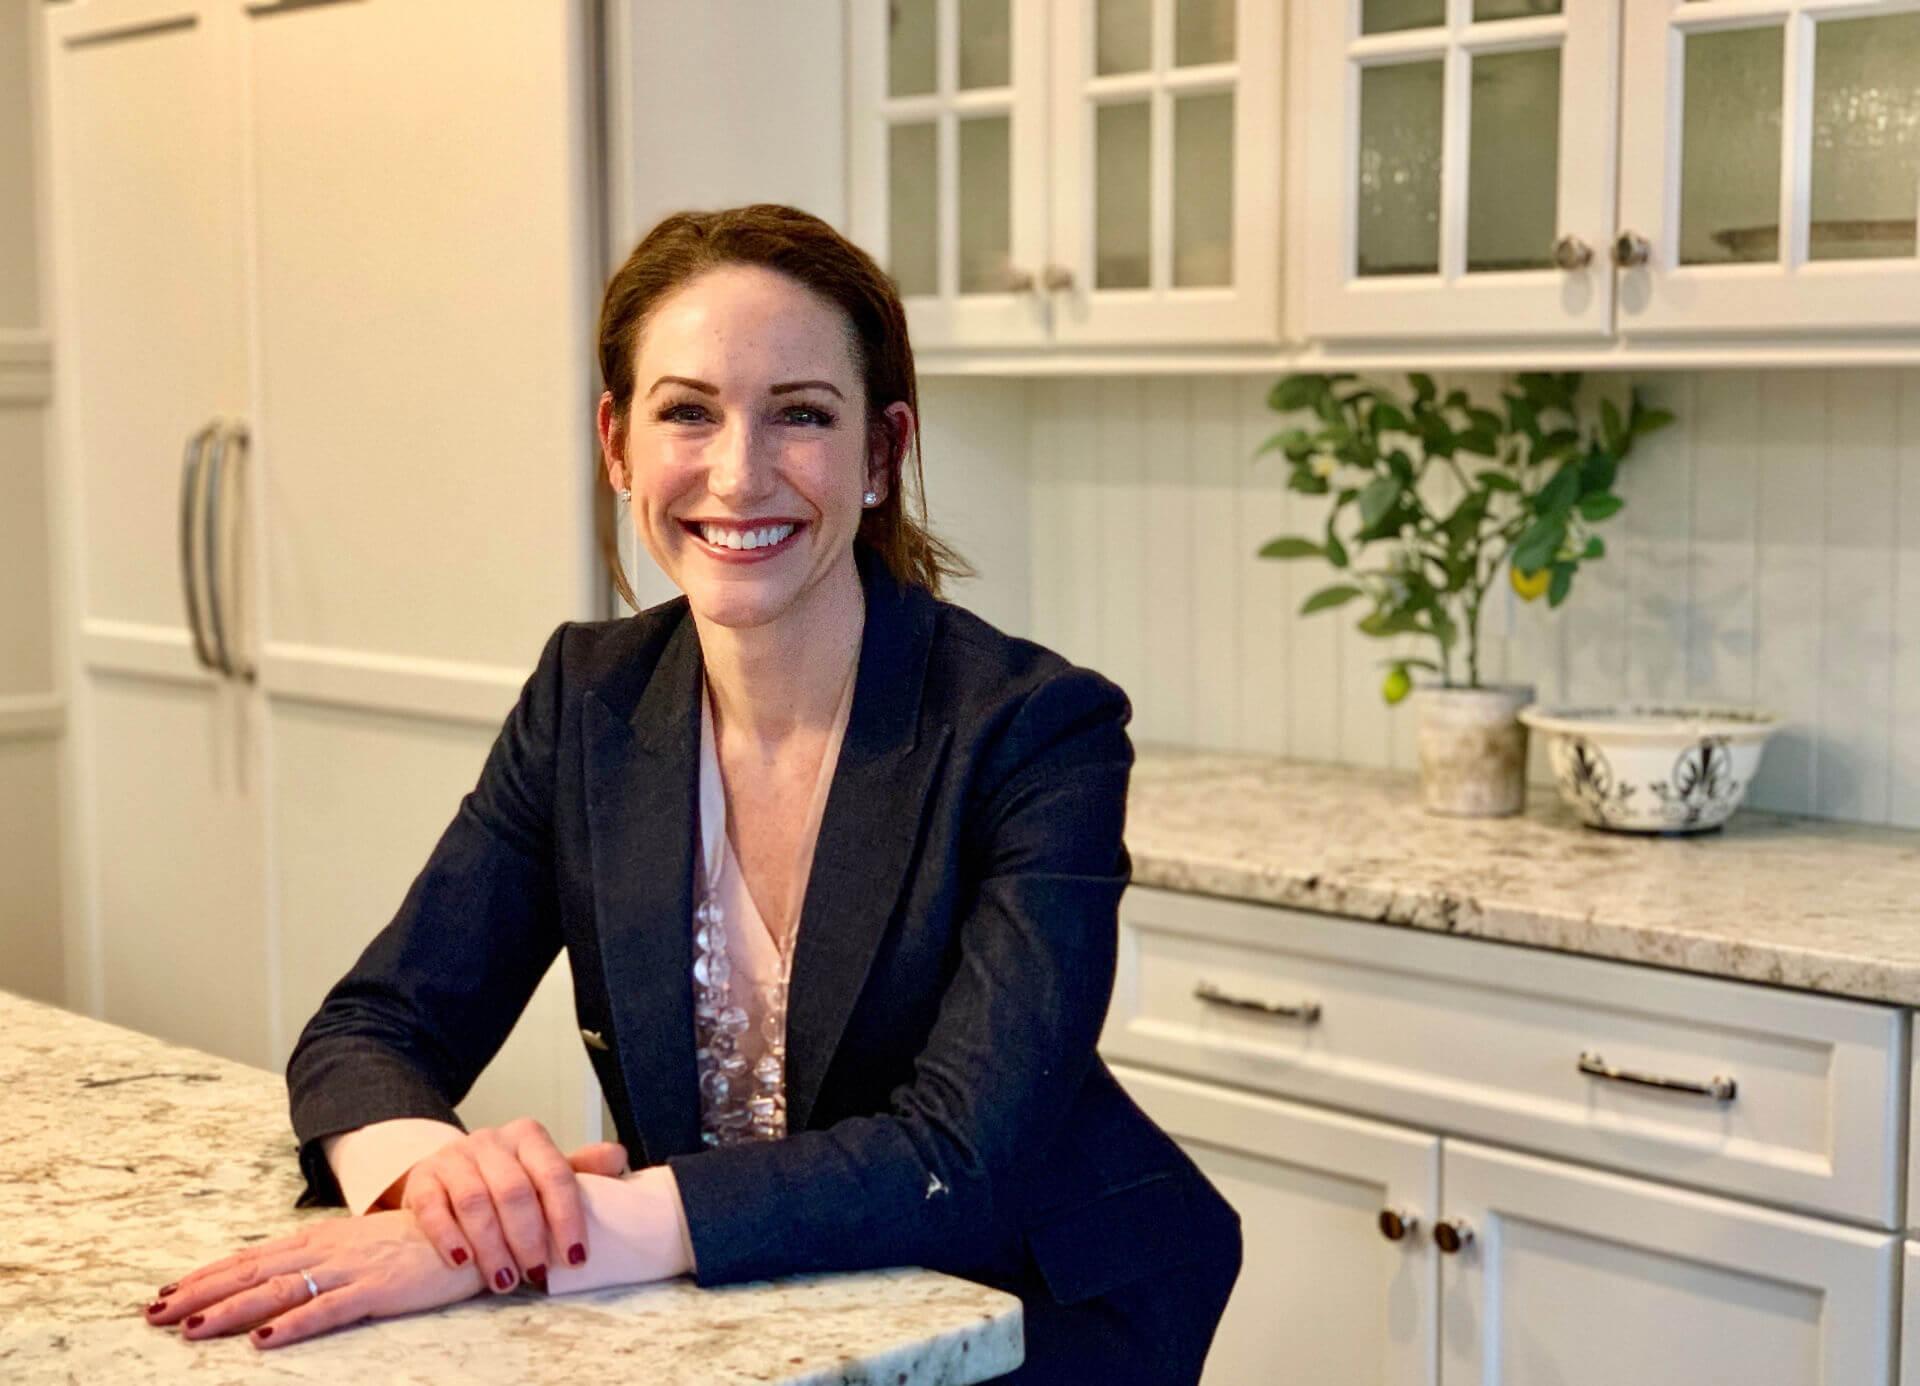 Jennifer Joy Johnson Glenview Illinois food allergy coach expert kids